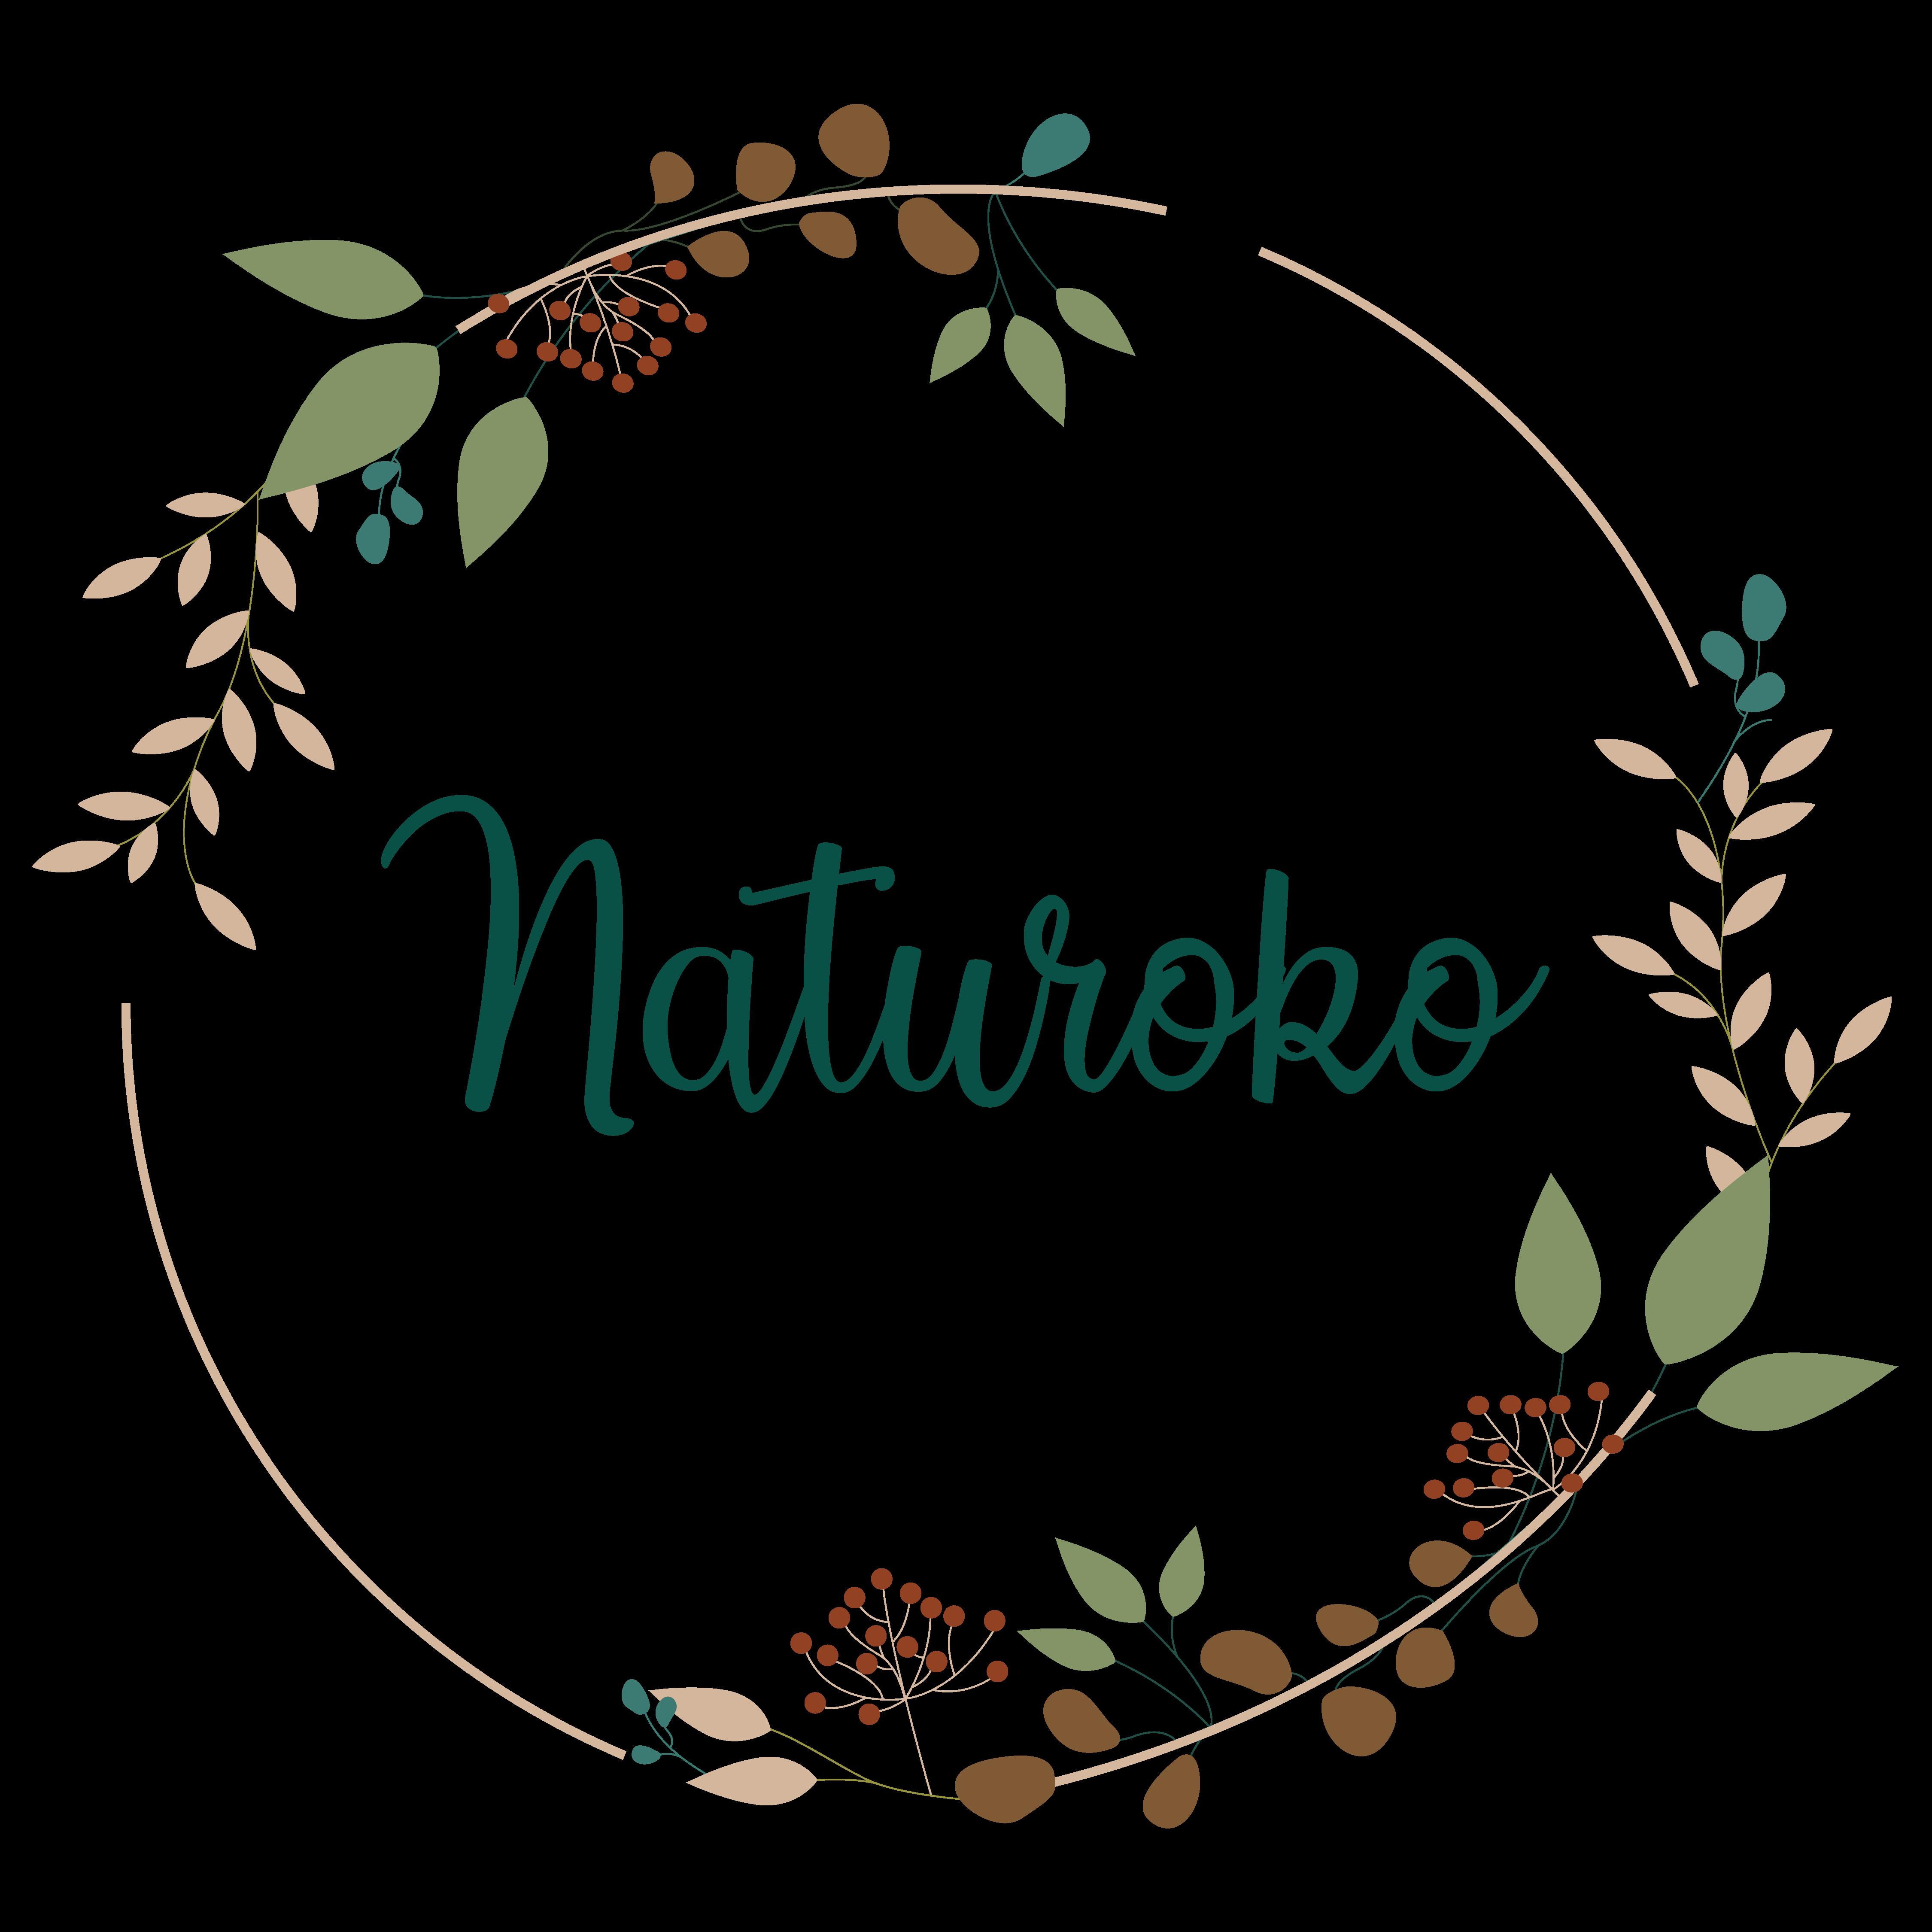 Naturoko